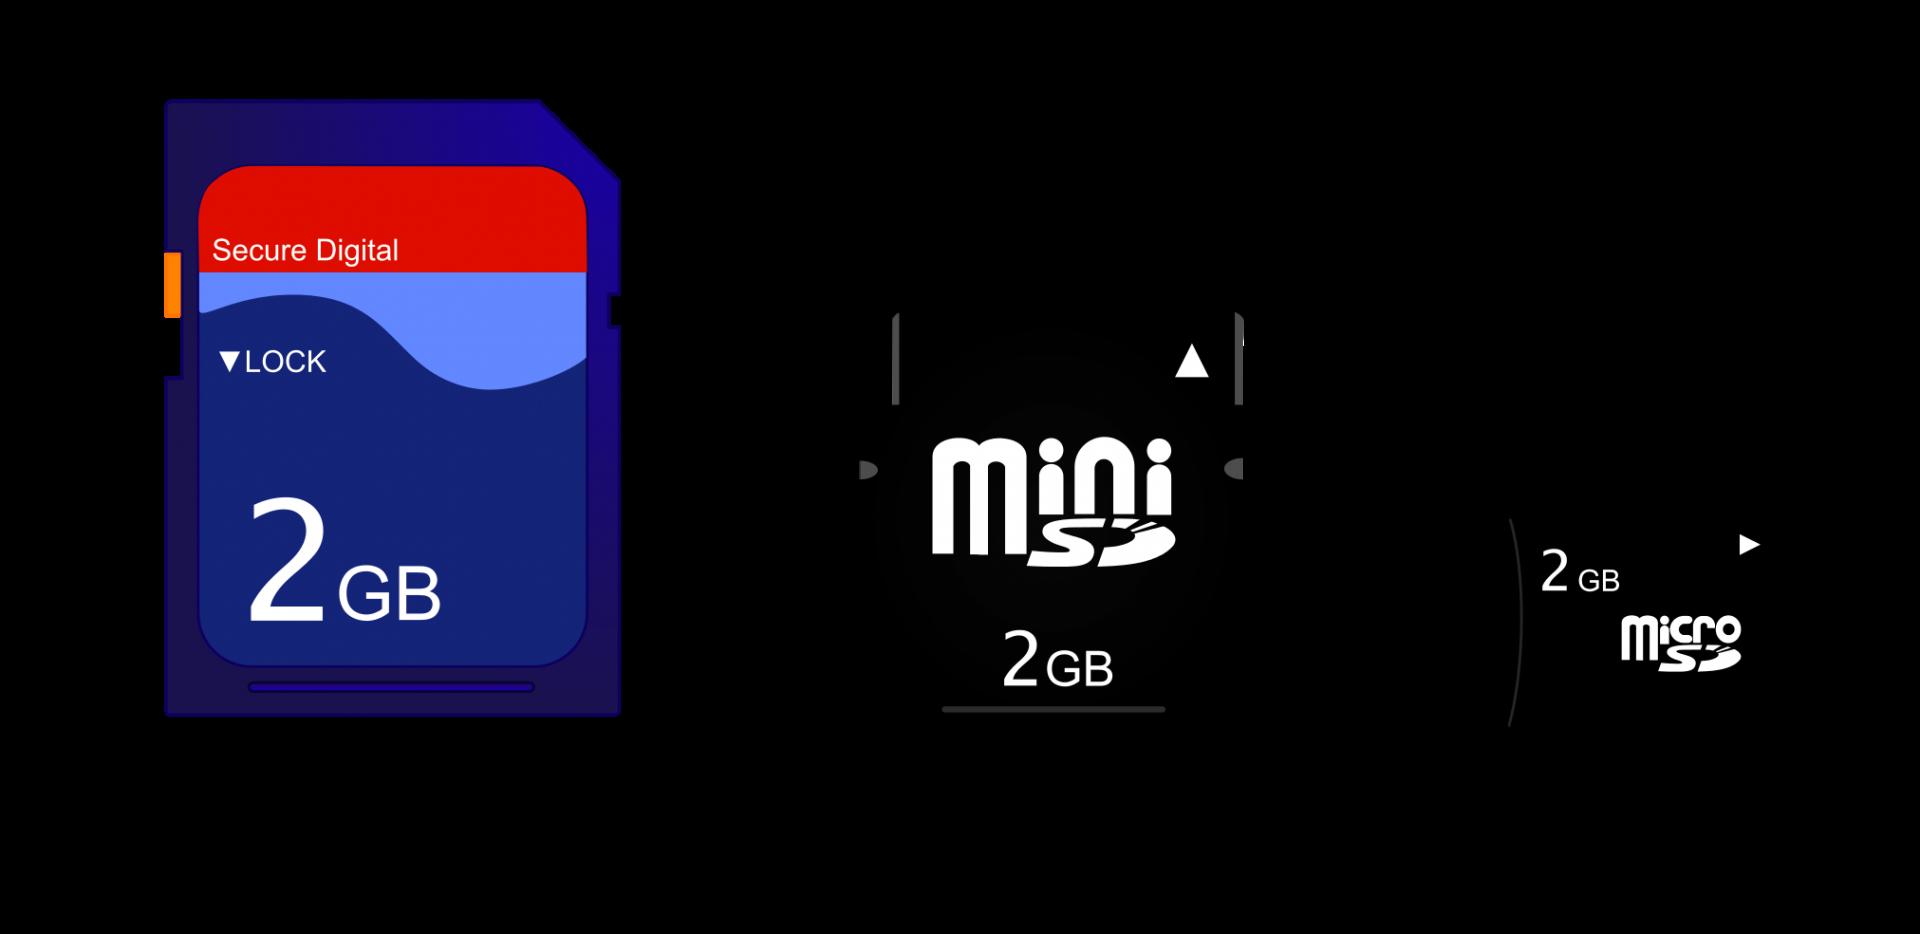 tarjeta Sd, miniSD, microSD